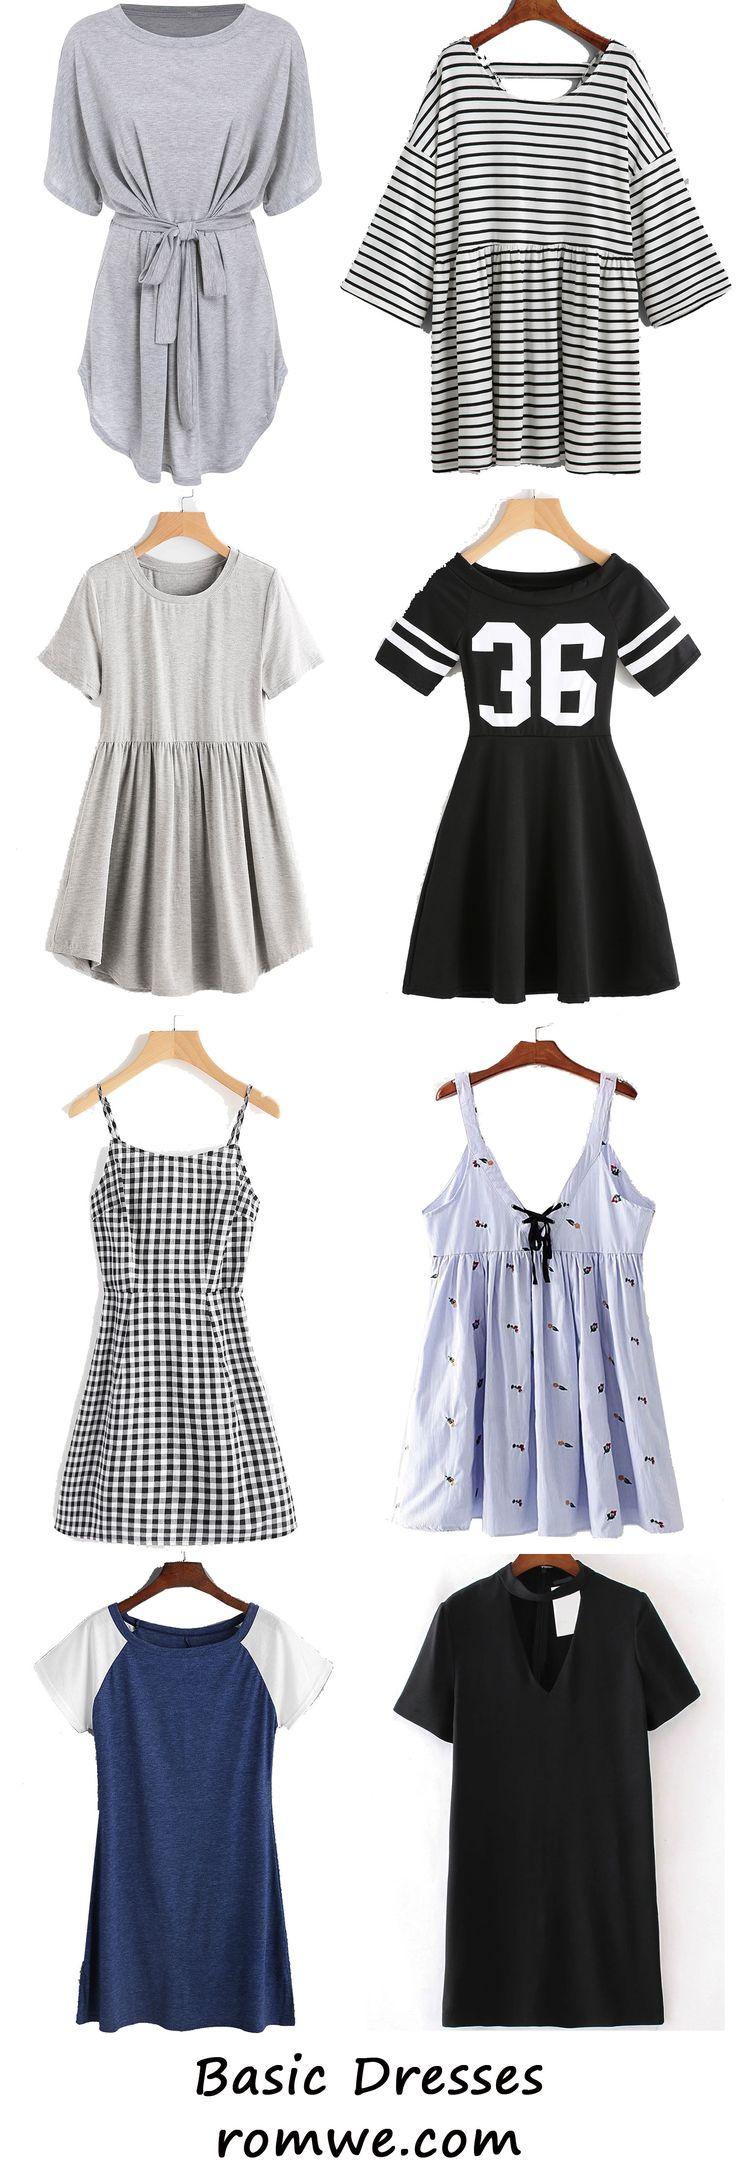 Chic Basic Dress - romwe.com